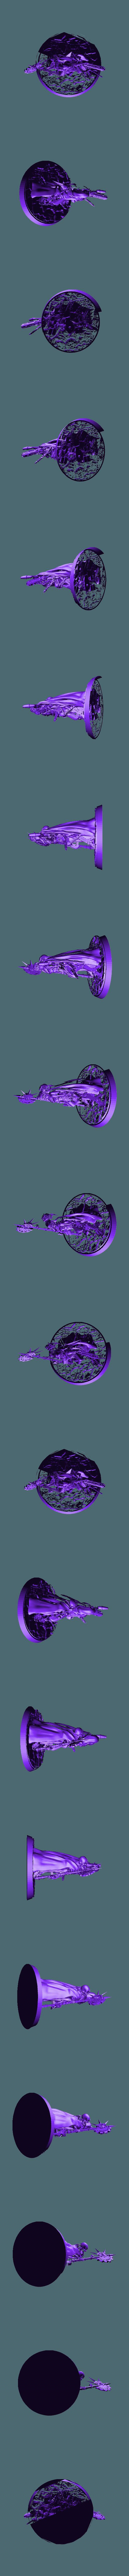 Female_Magos_body.stl Download free STL file Martian Magos with Mammaries • 3D printable model, ErikTheHeretek